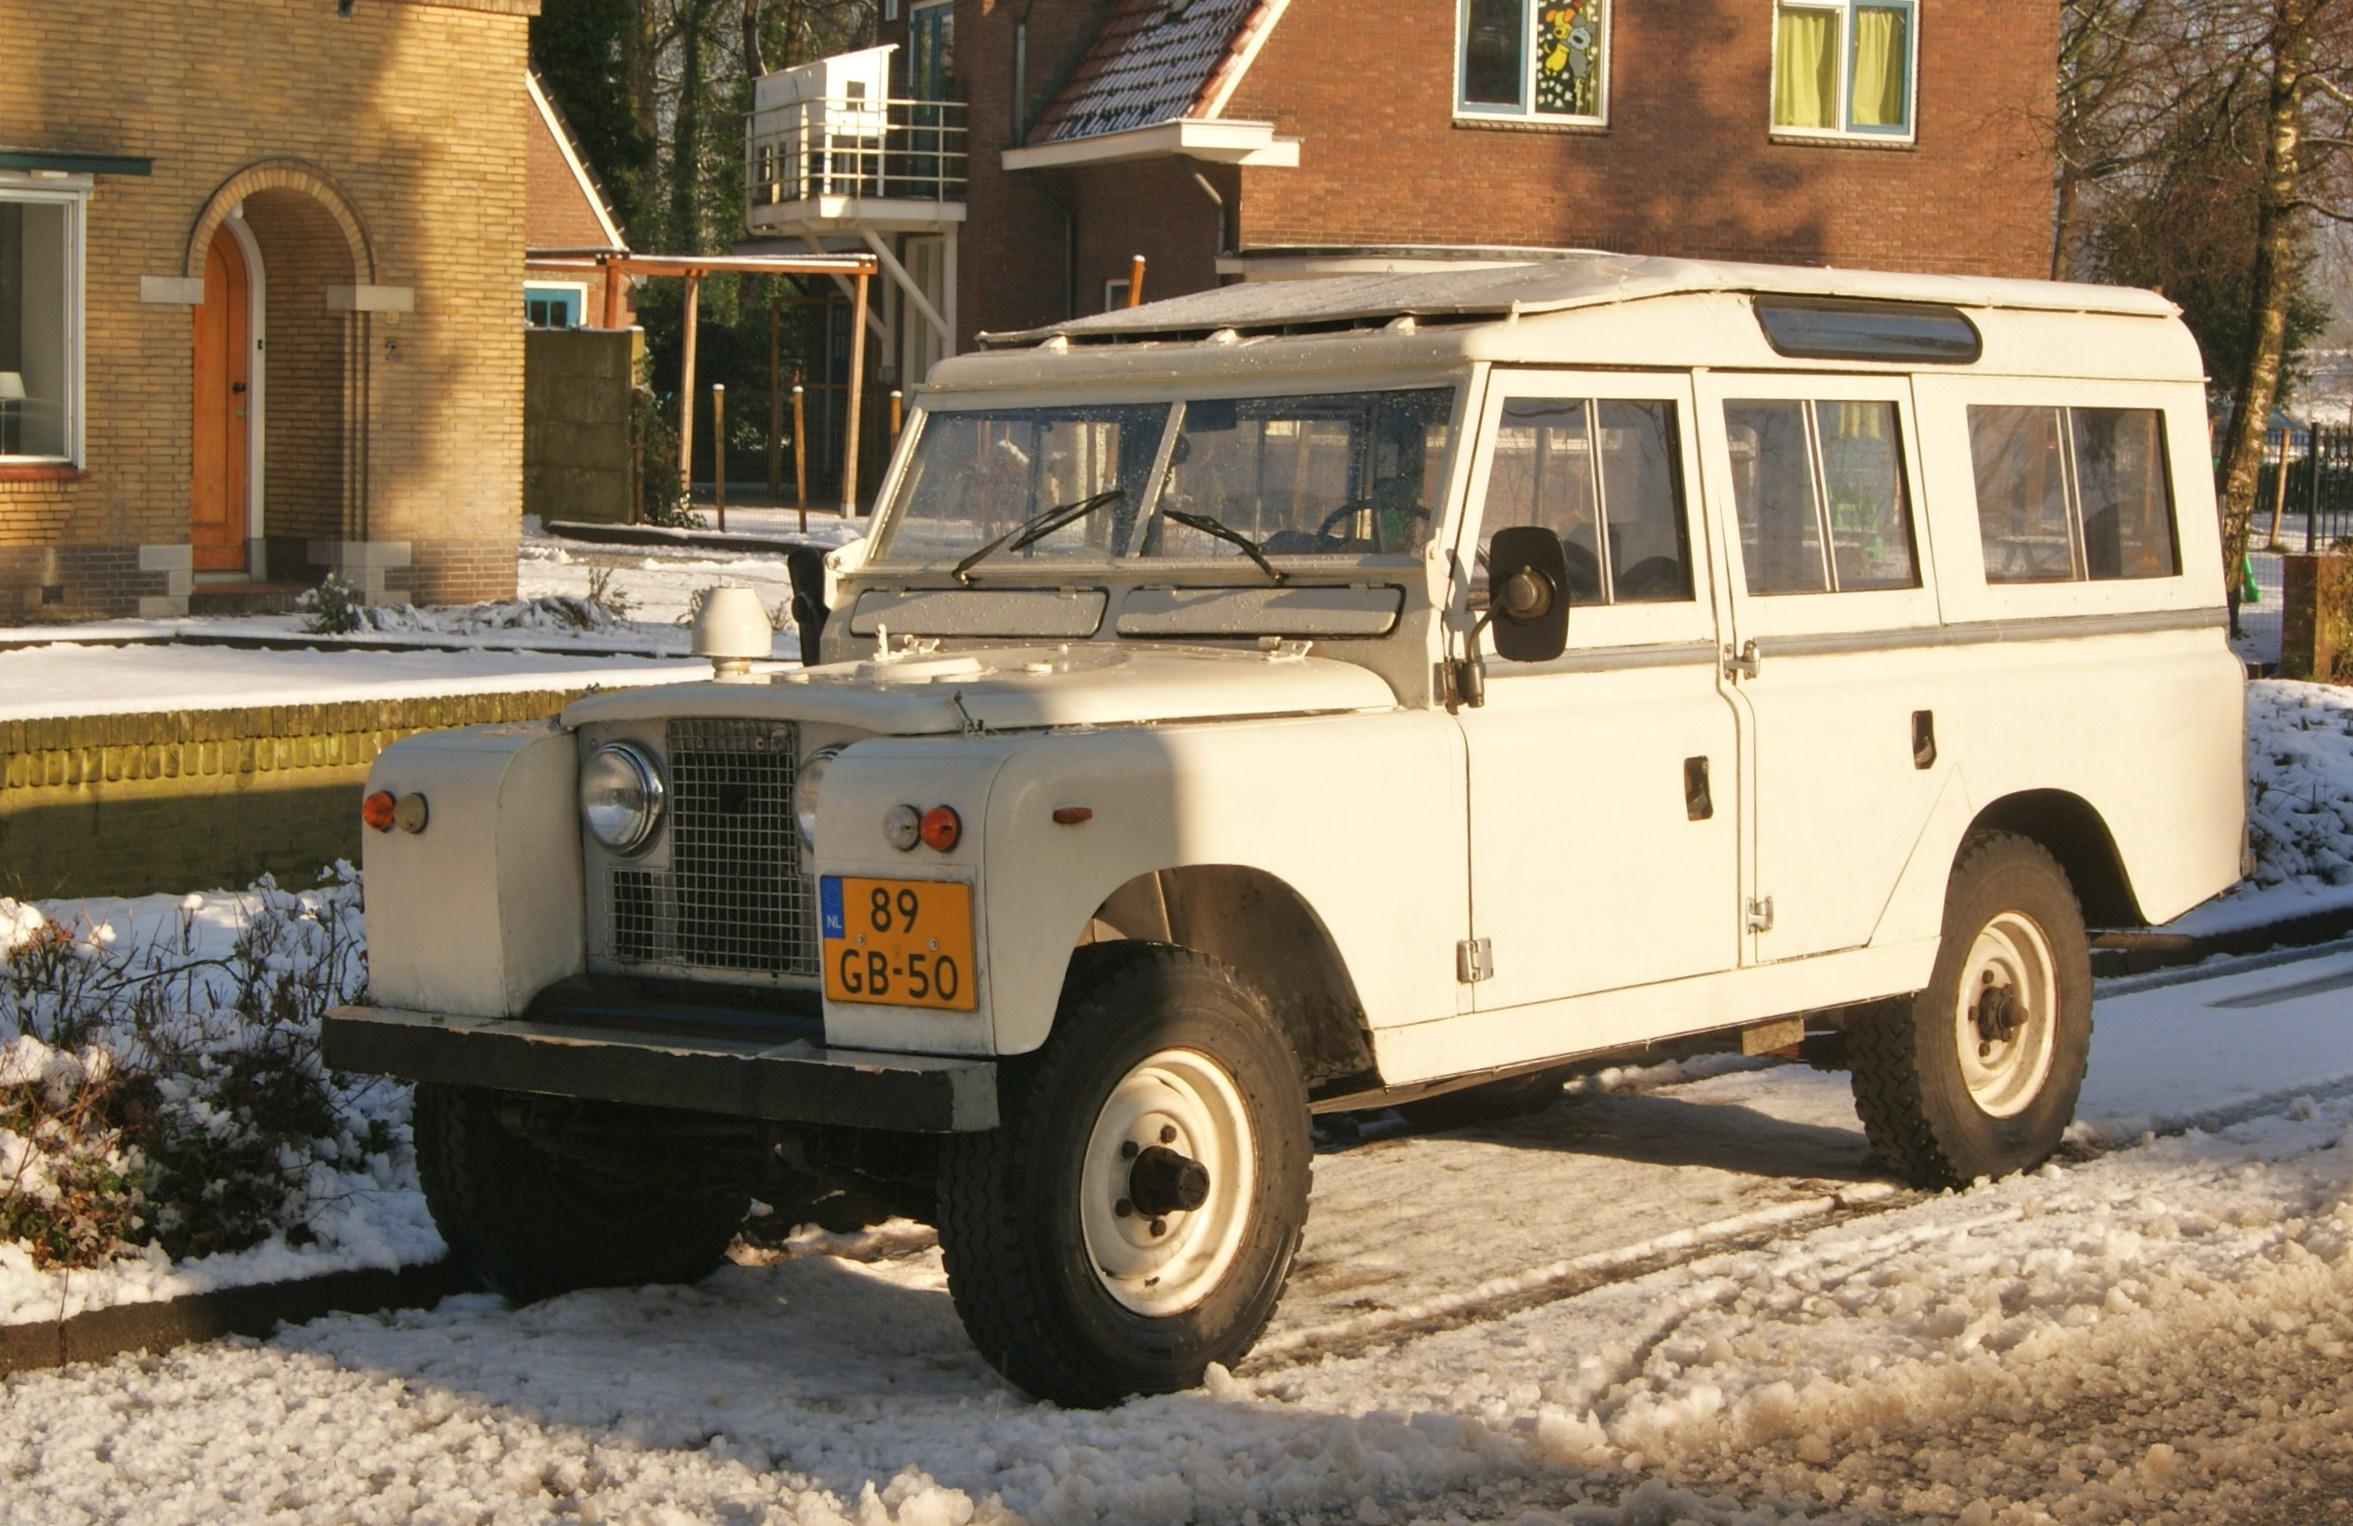 1963_Land_Rover_109%22_Series_IIA_(84508